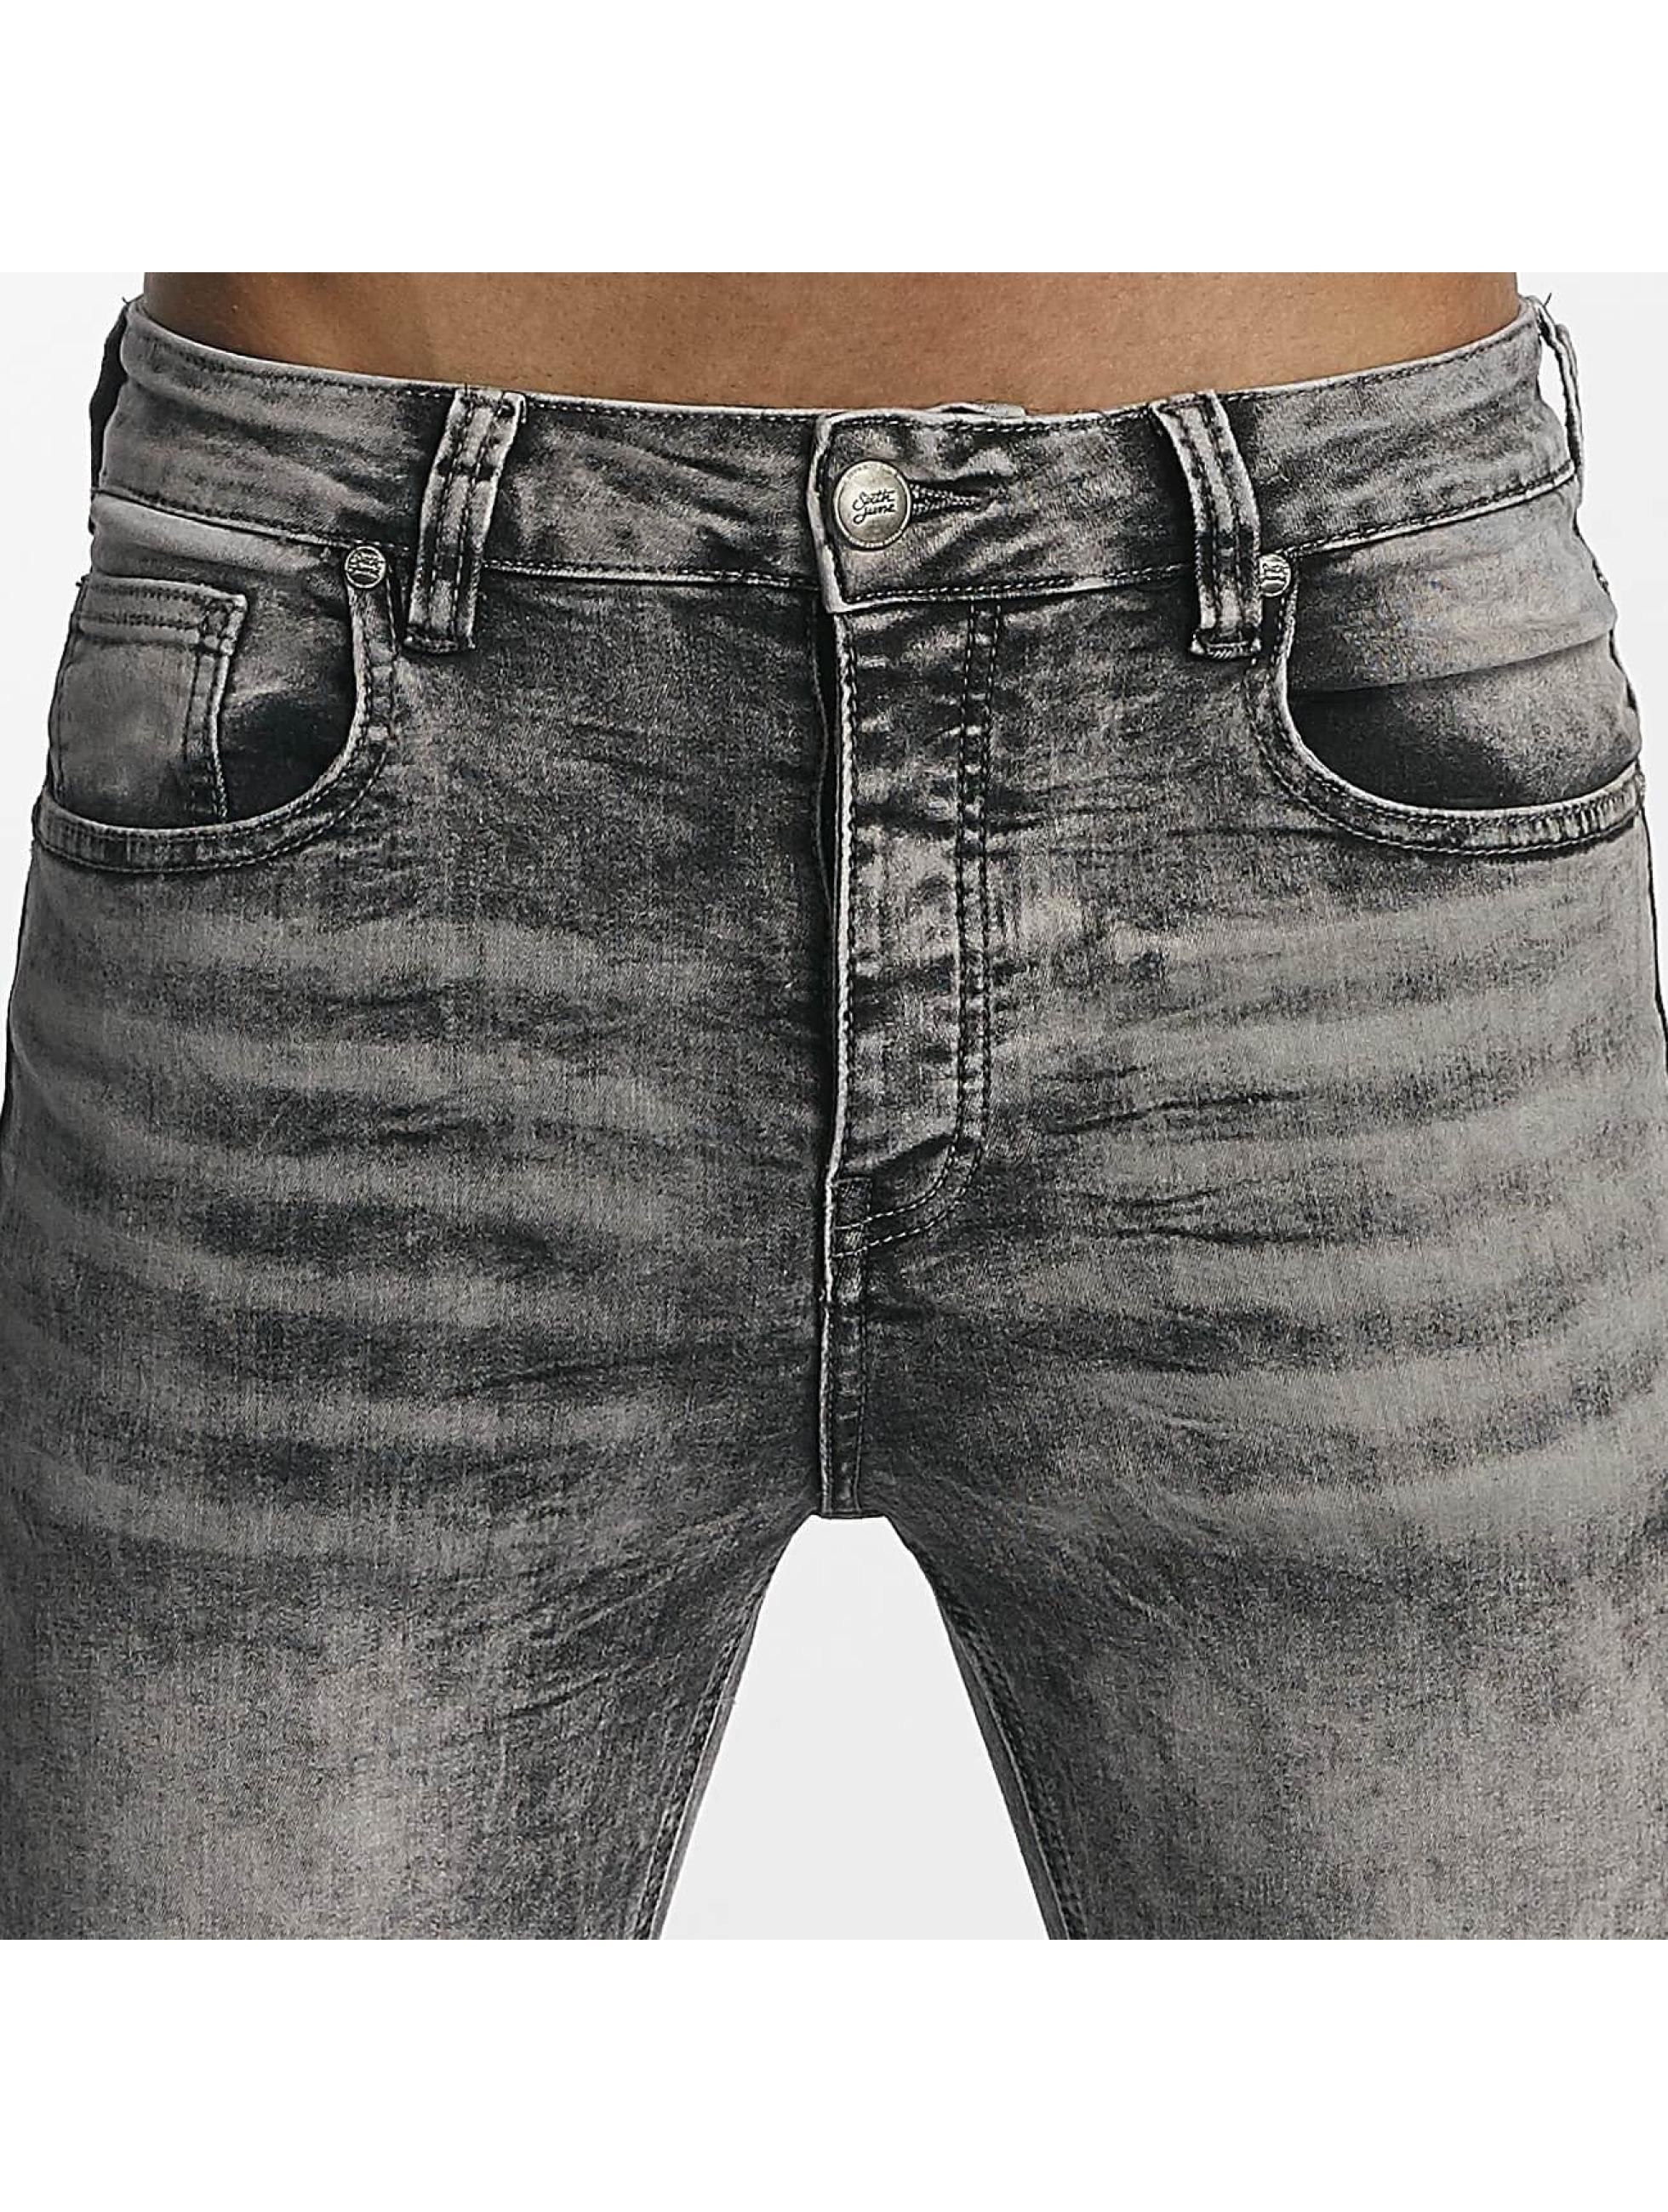 Sixth June Jeans ajustado Classic Slimfit gris